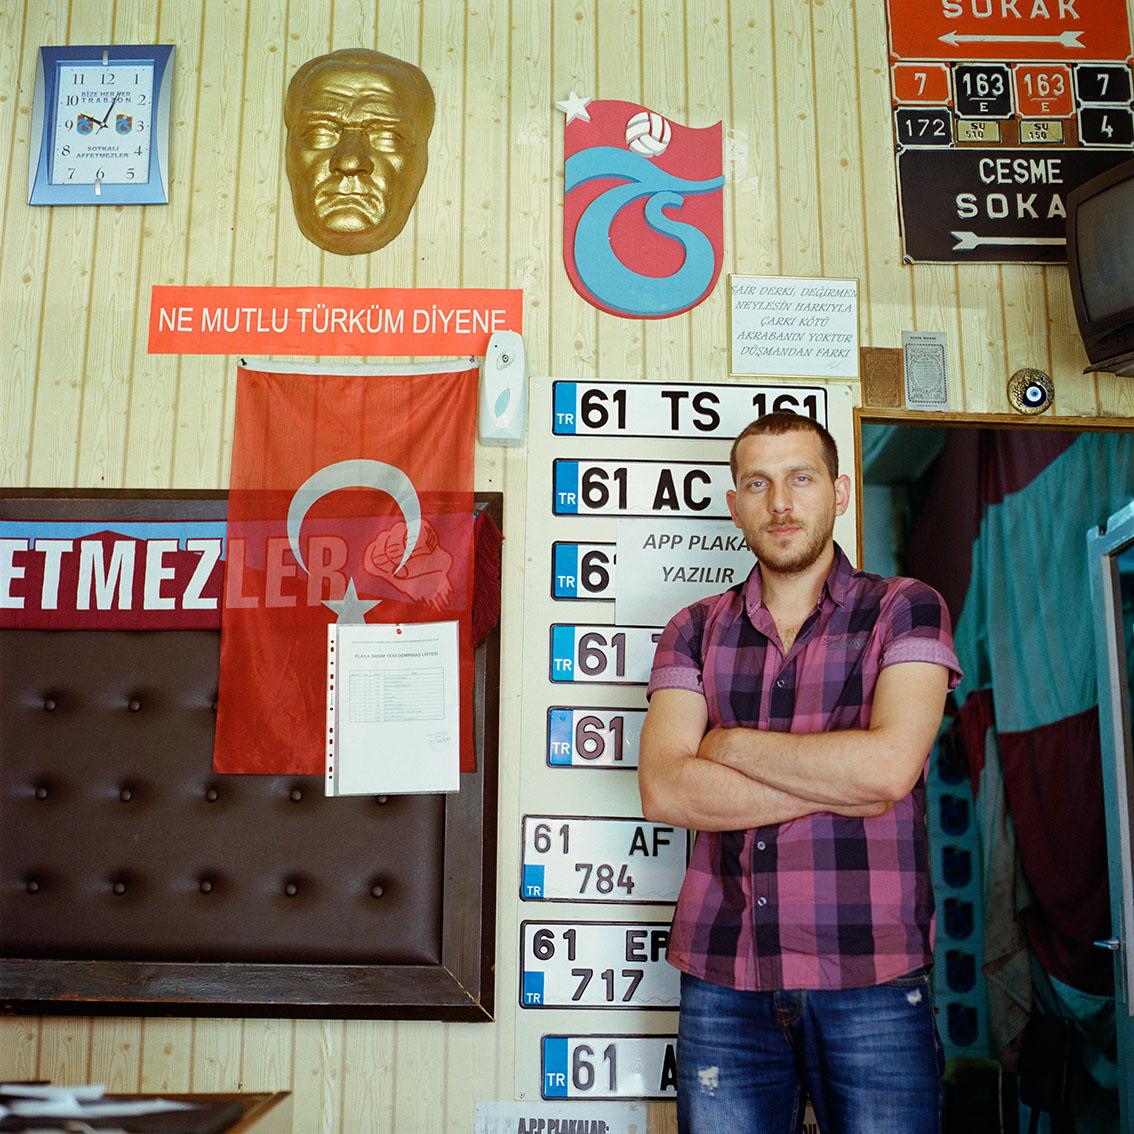 Car registration shop in Trabzon, Turkey